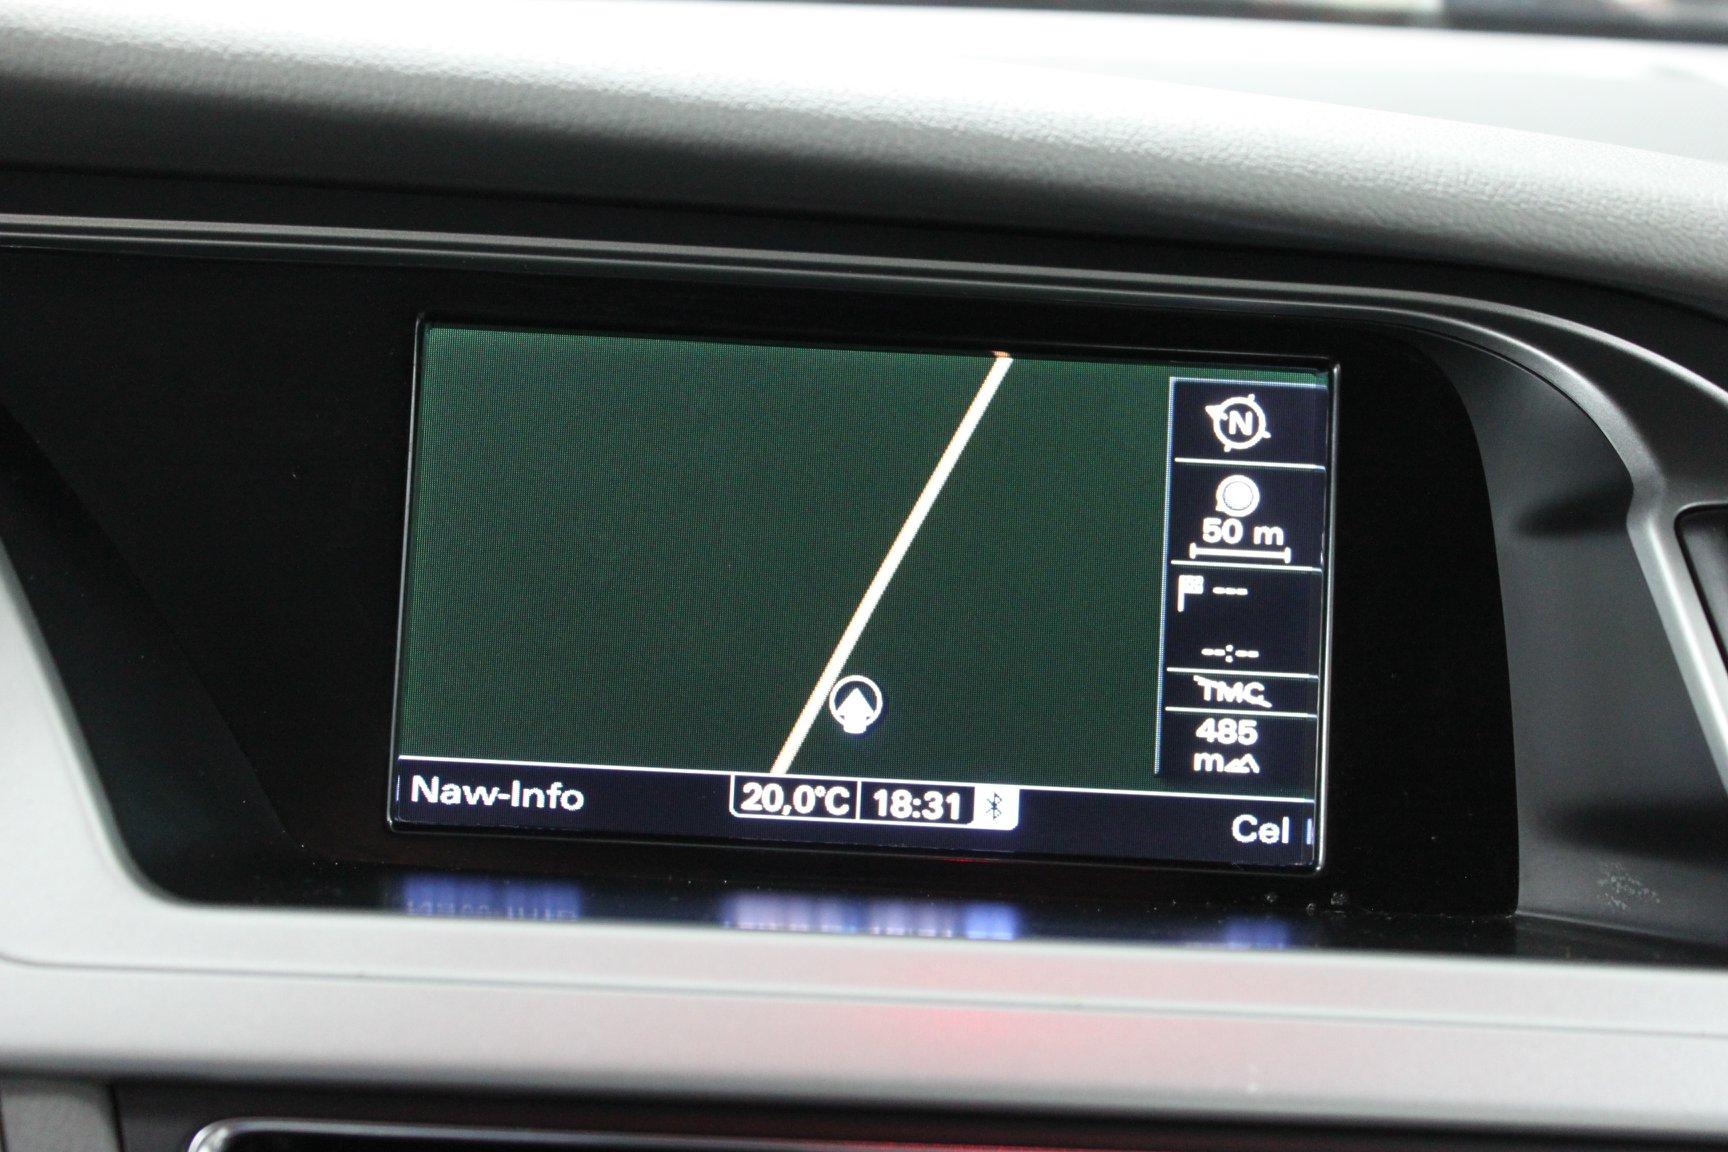 AUDI A4 B8 2.0 TFSI QUATTRO 2012